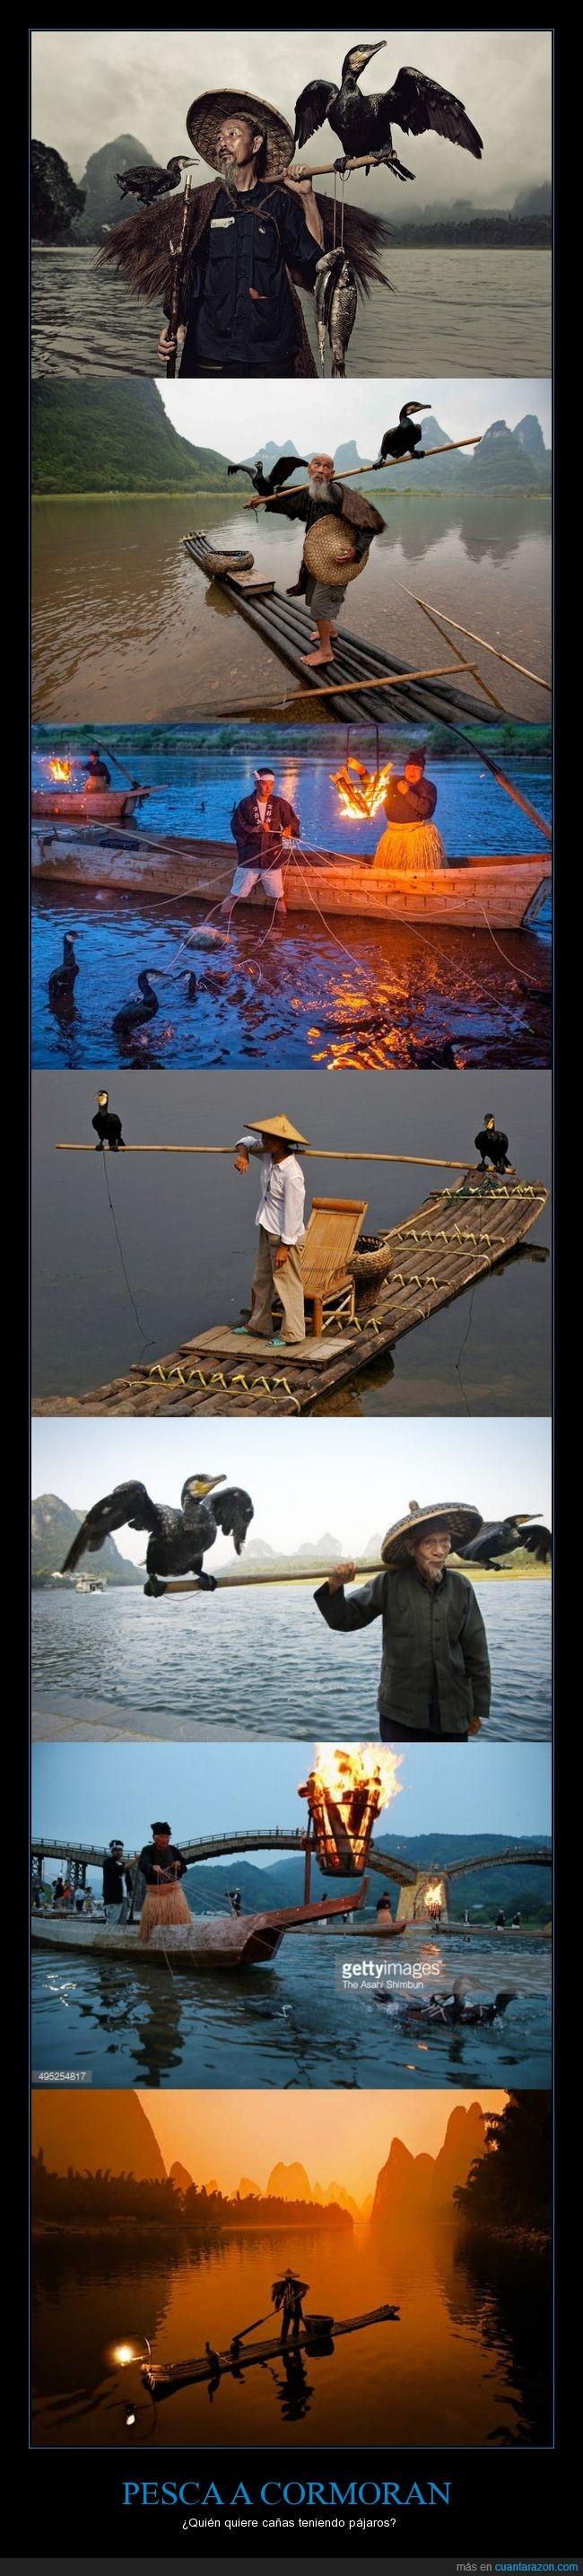 Ave,China,Cormoran,Pájaro,Pesca,Yangshou